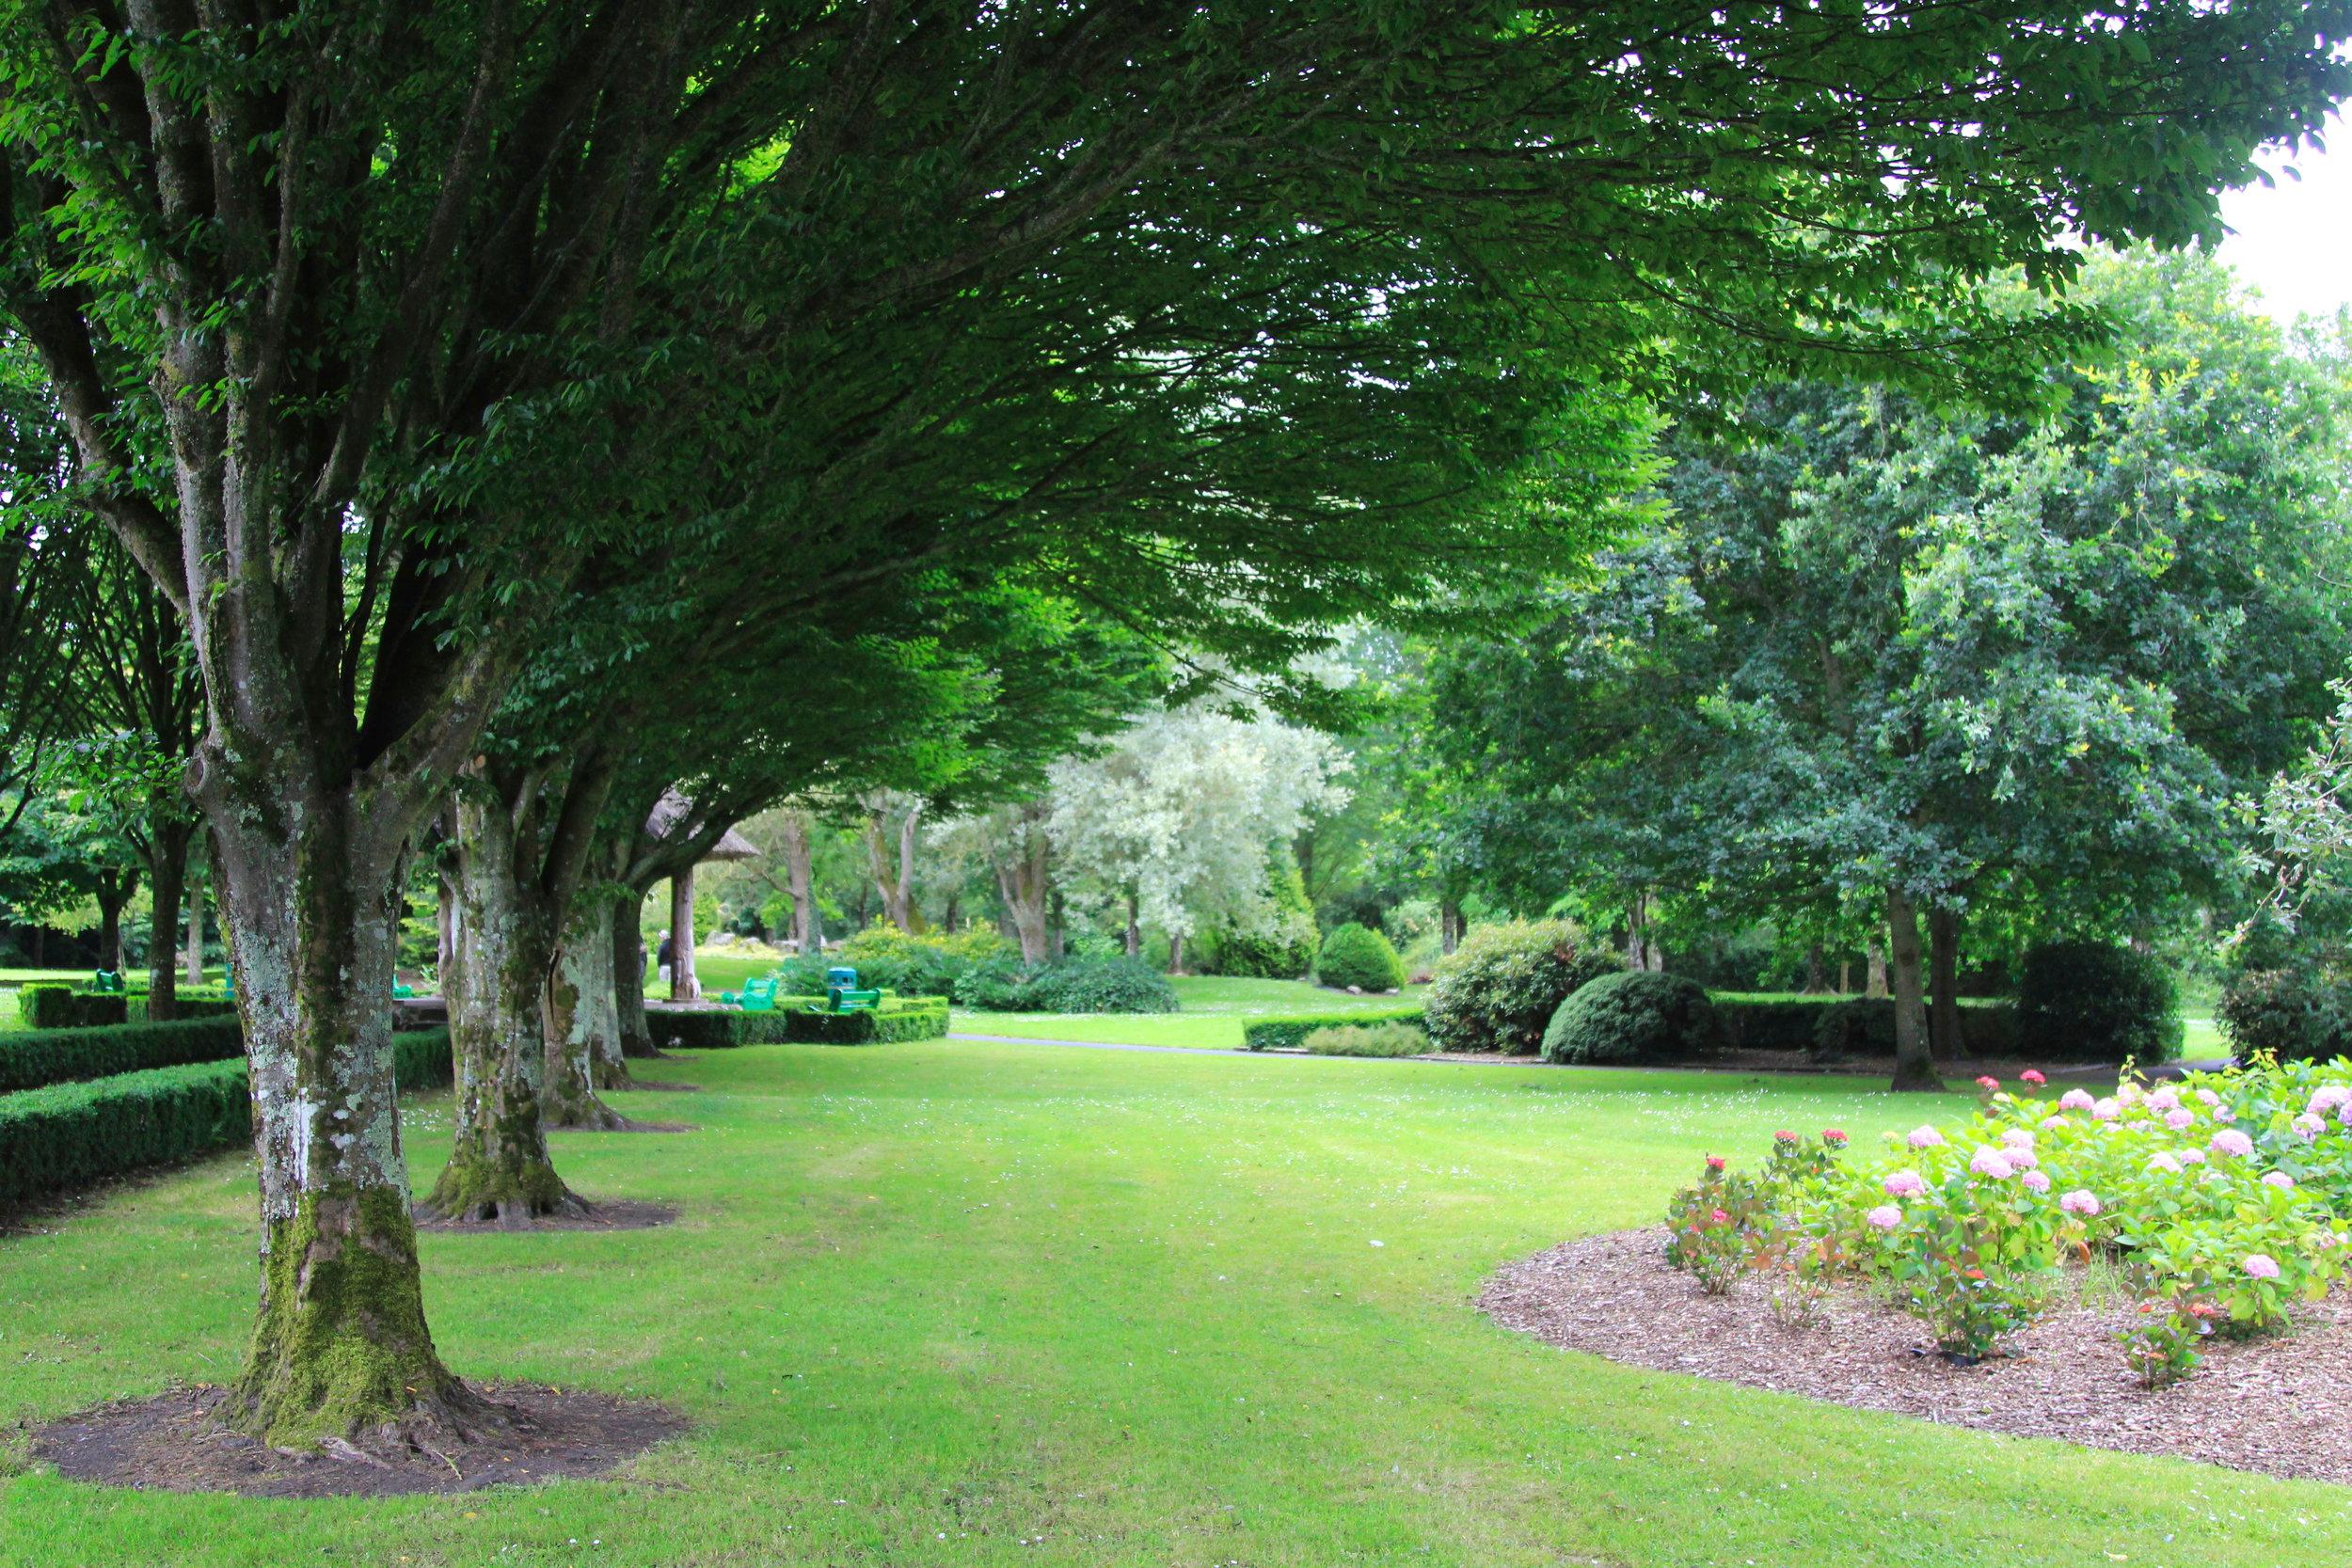 Celtic Park and Gardens, Adare, Ireland